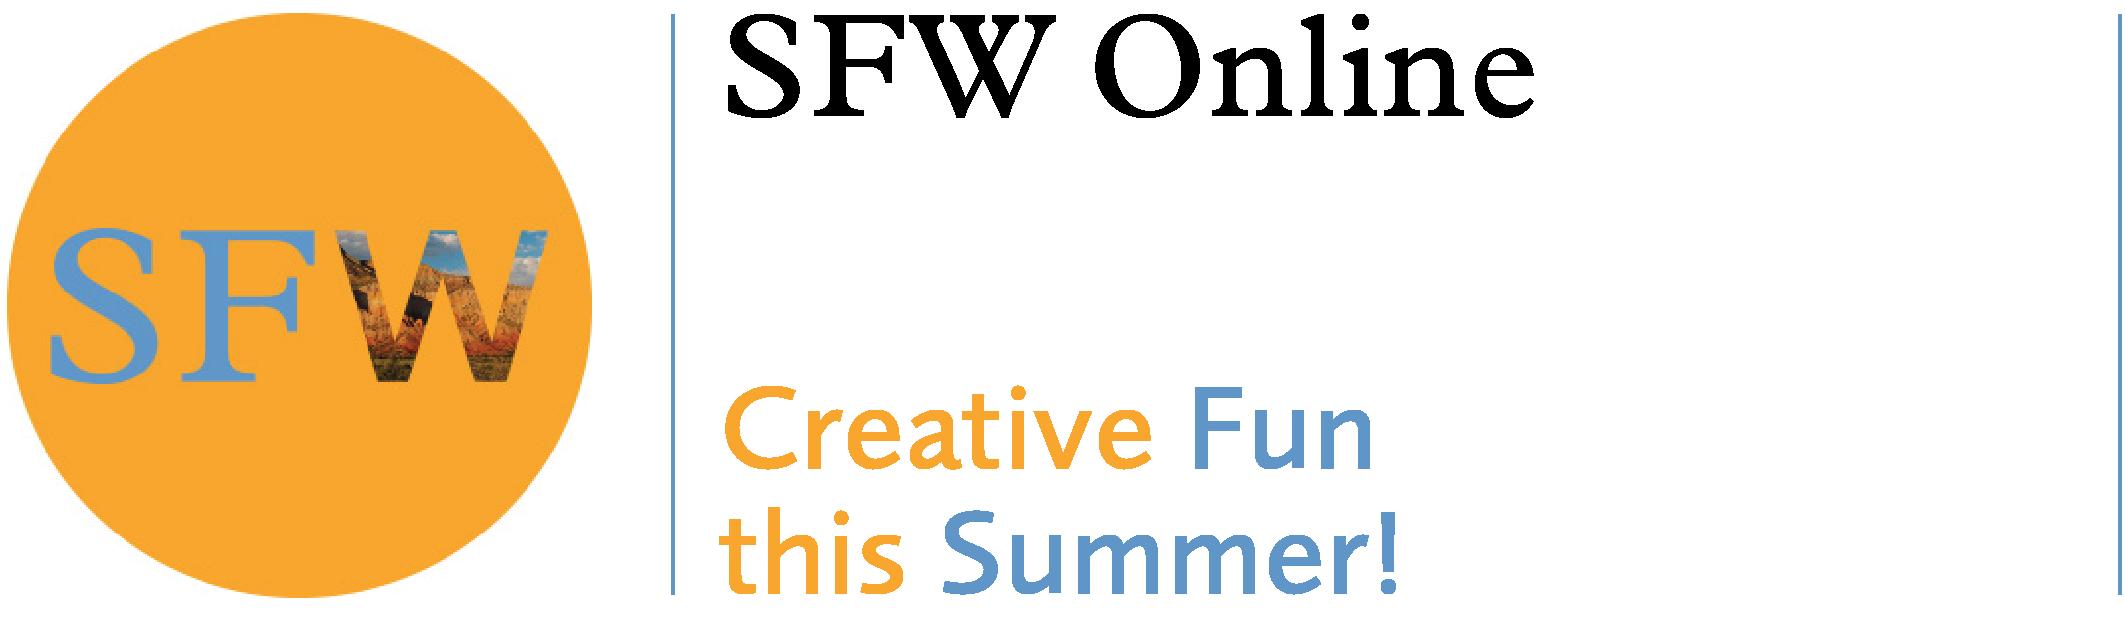 SFW Online: Summer Fun